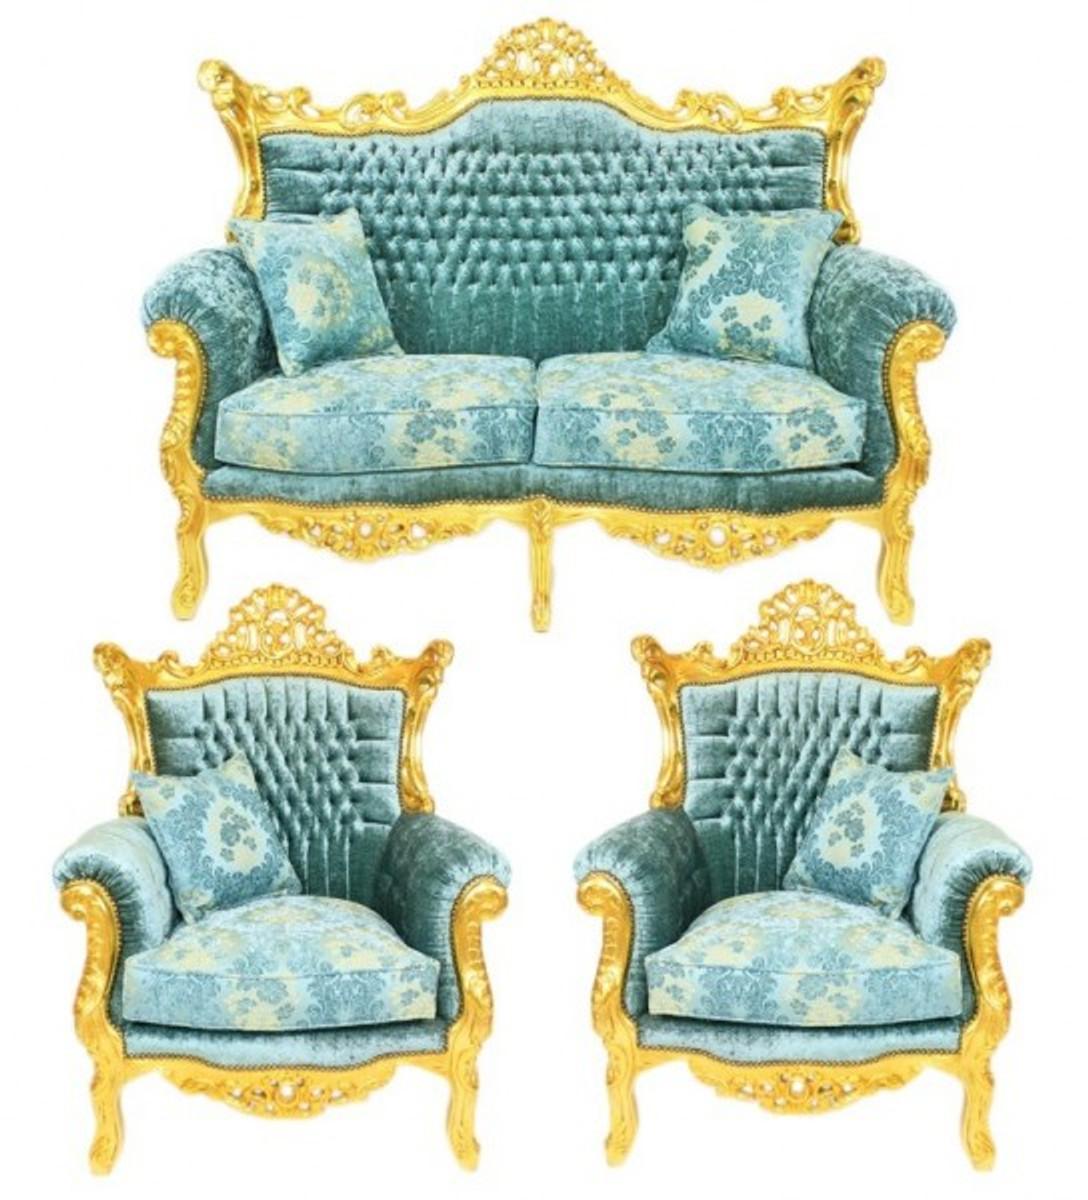 GroBartig Casa Padrino Barock Wohnzimmer Set Master Türkis Blau Muster Samtstoff /  Gold   2er Sofa + 2 Sessel   Limited Edition!